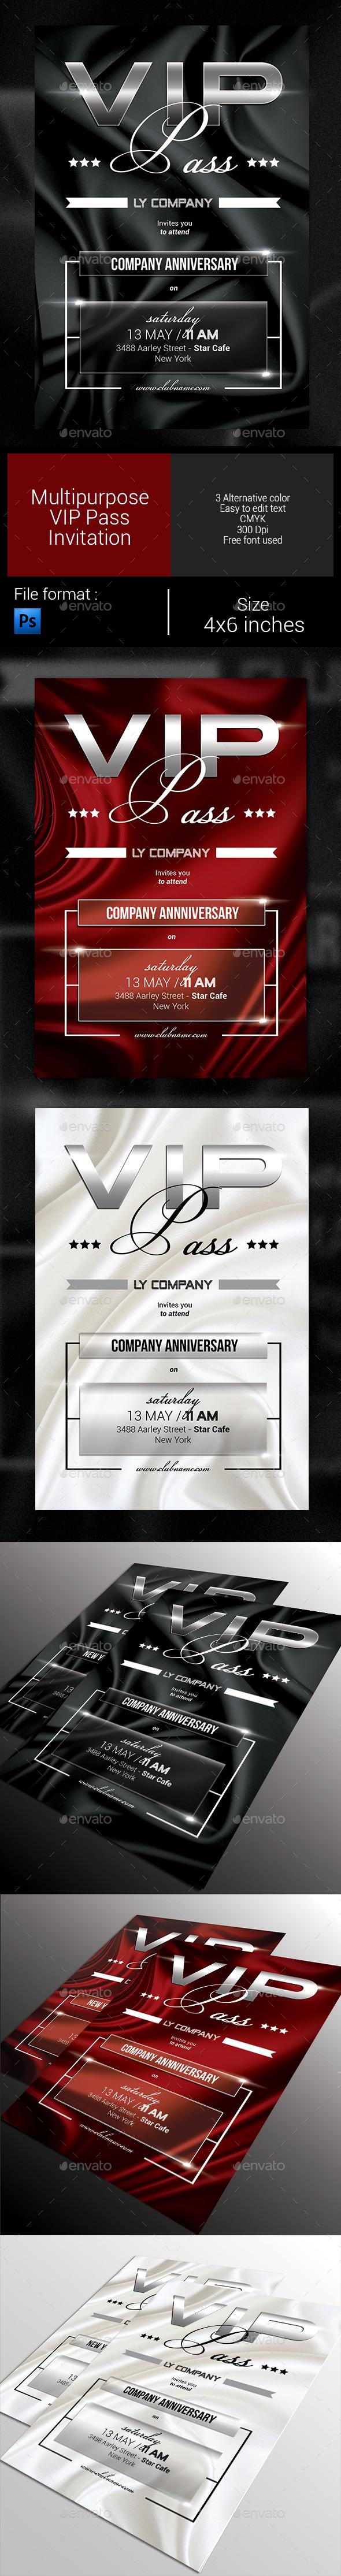 Multipurpose VIP Pass Invitation - Invitations Cards & Invites